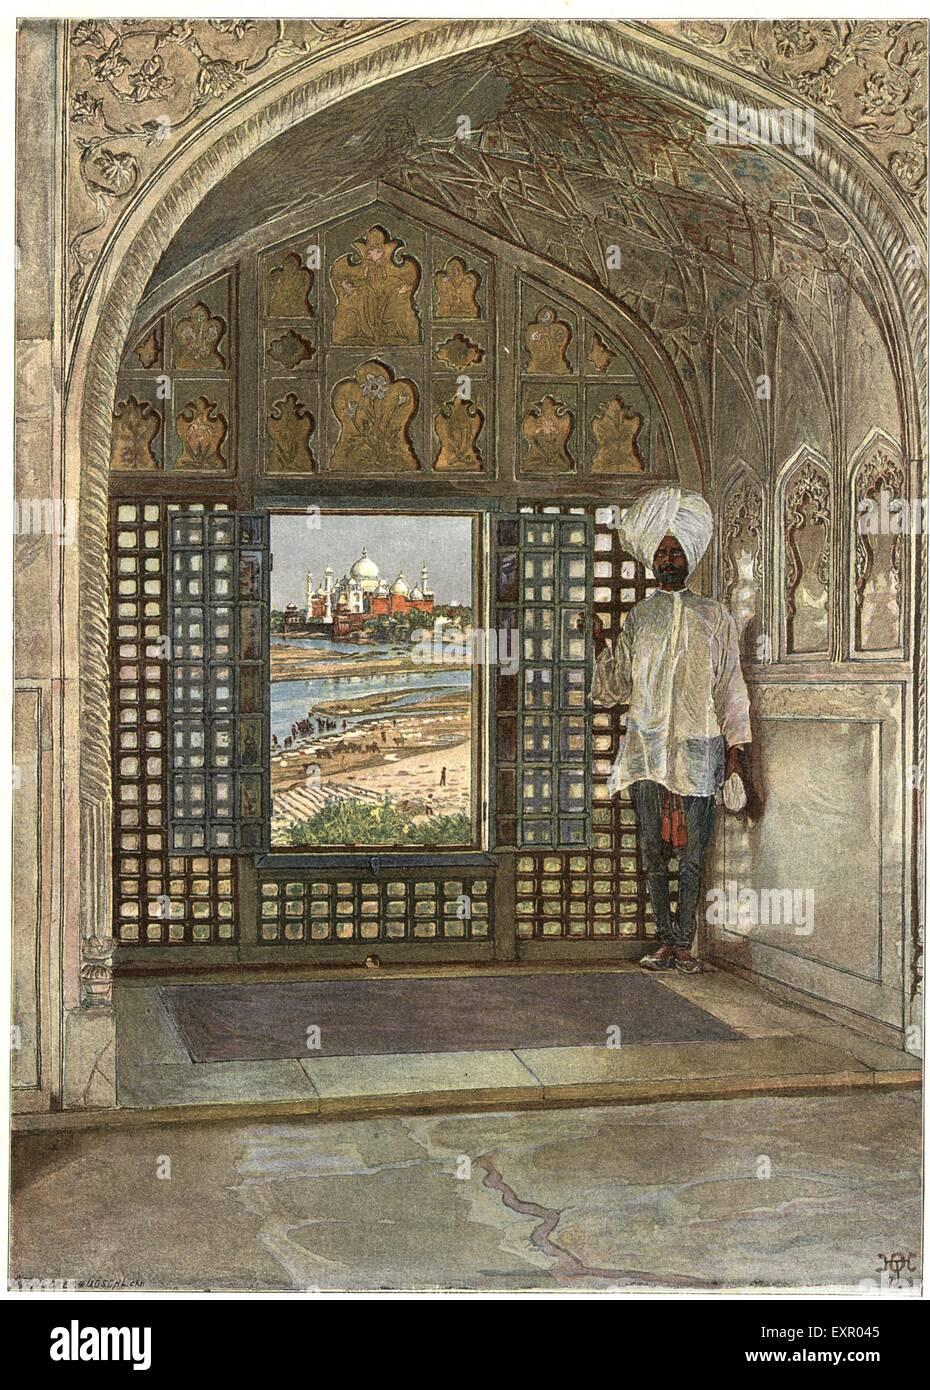 1910s UK India The British Empire Last Days Raj Magazine Plate - Stock Image